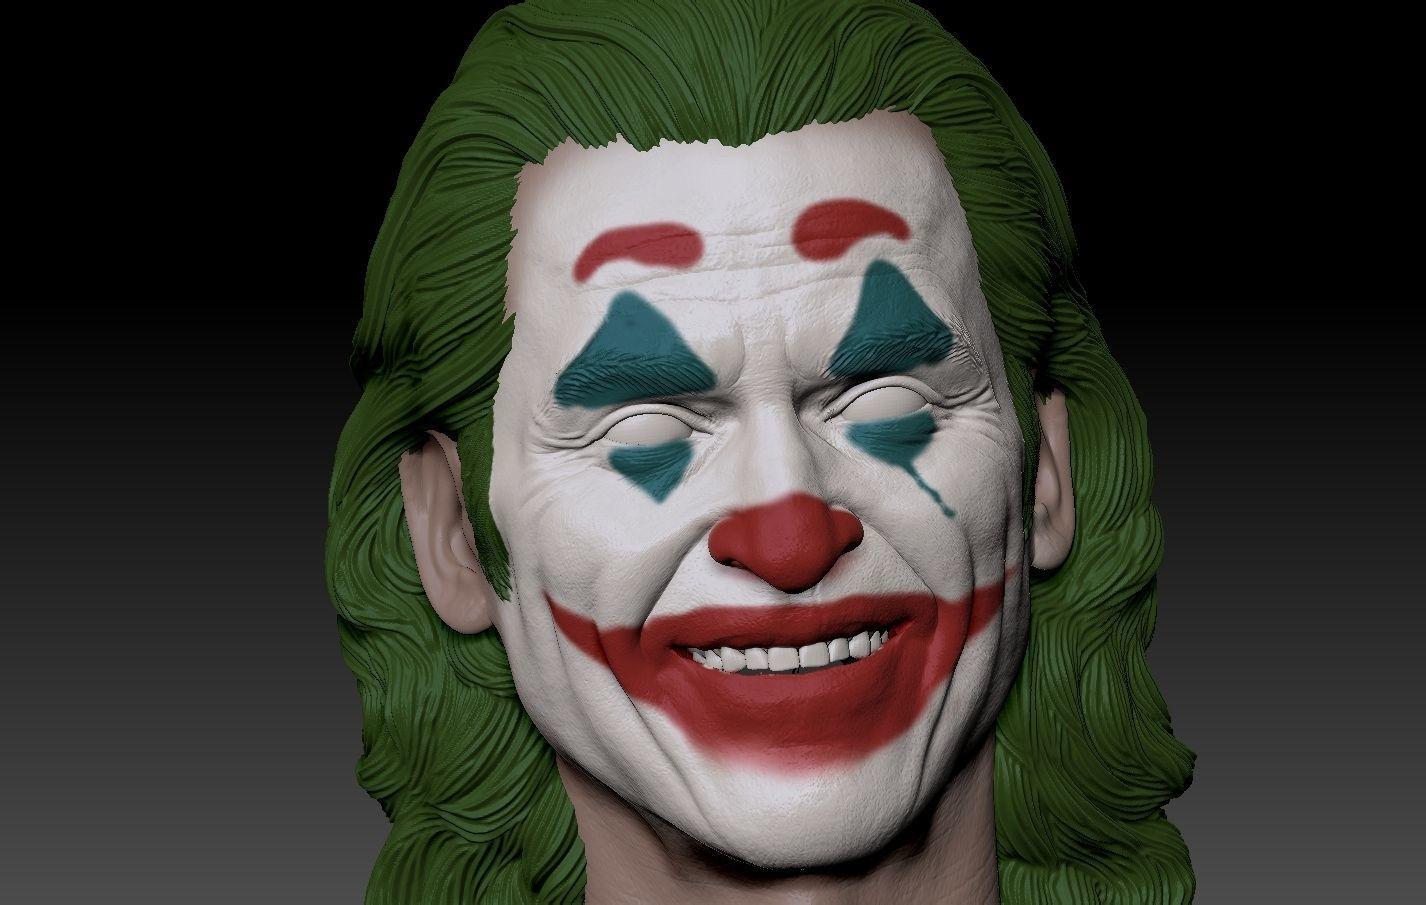 Joker 2019 Smile head Joaquin Phoenix